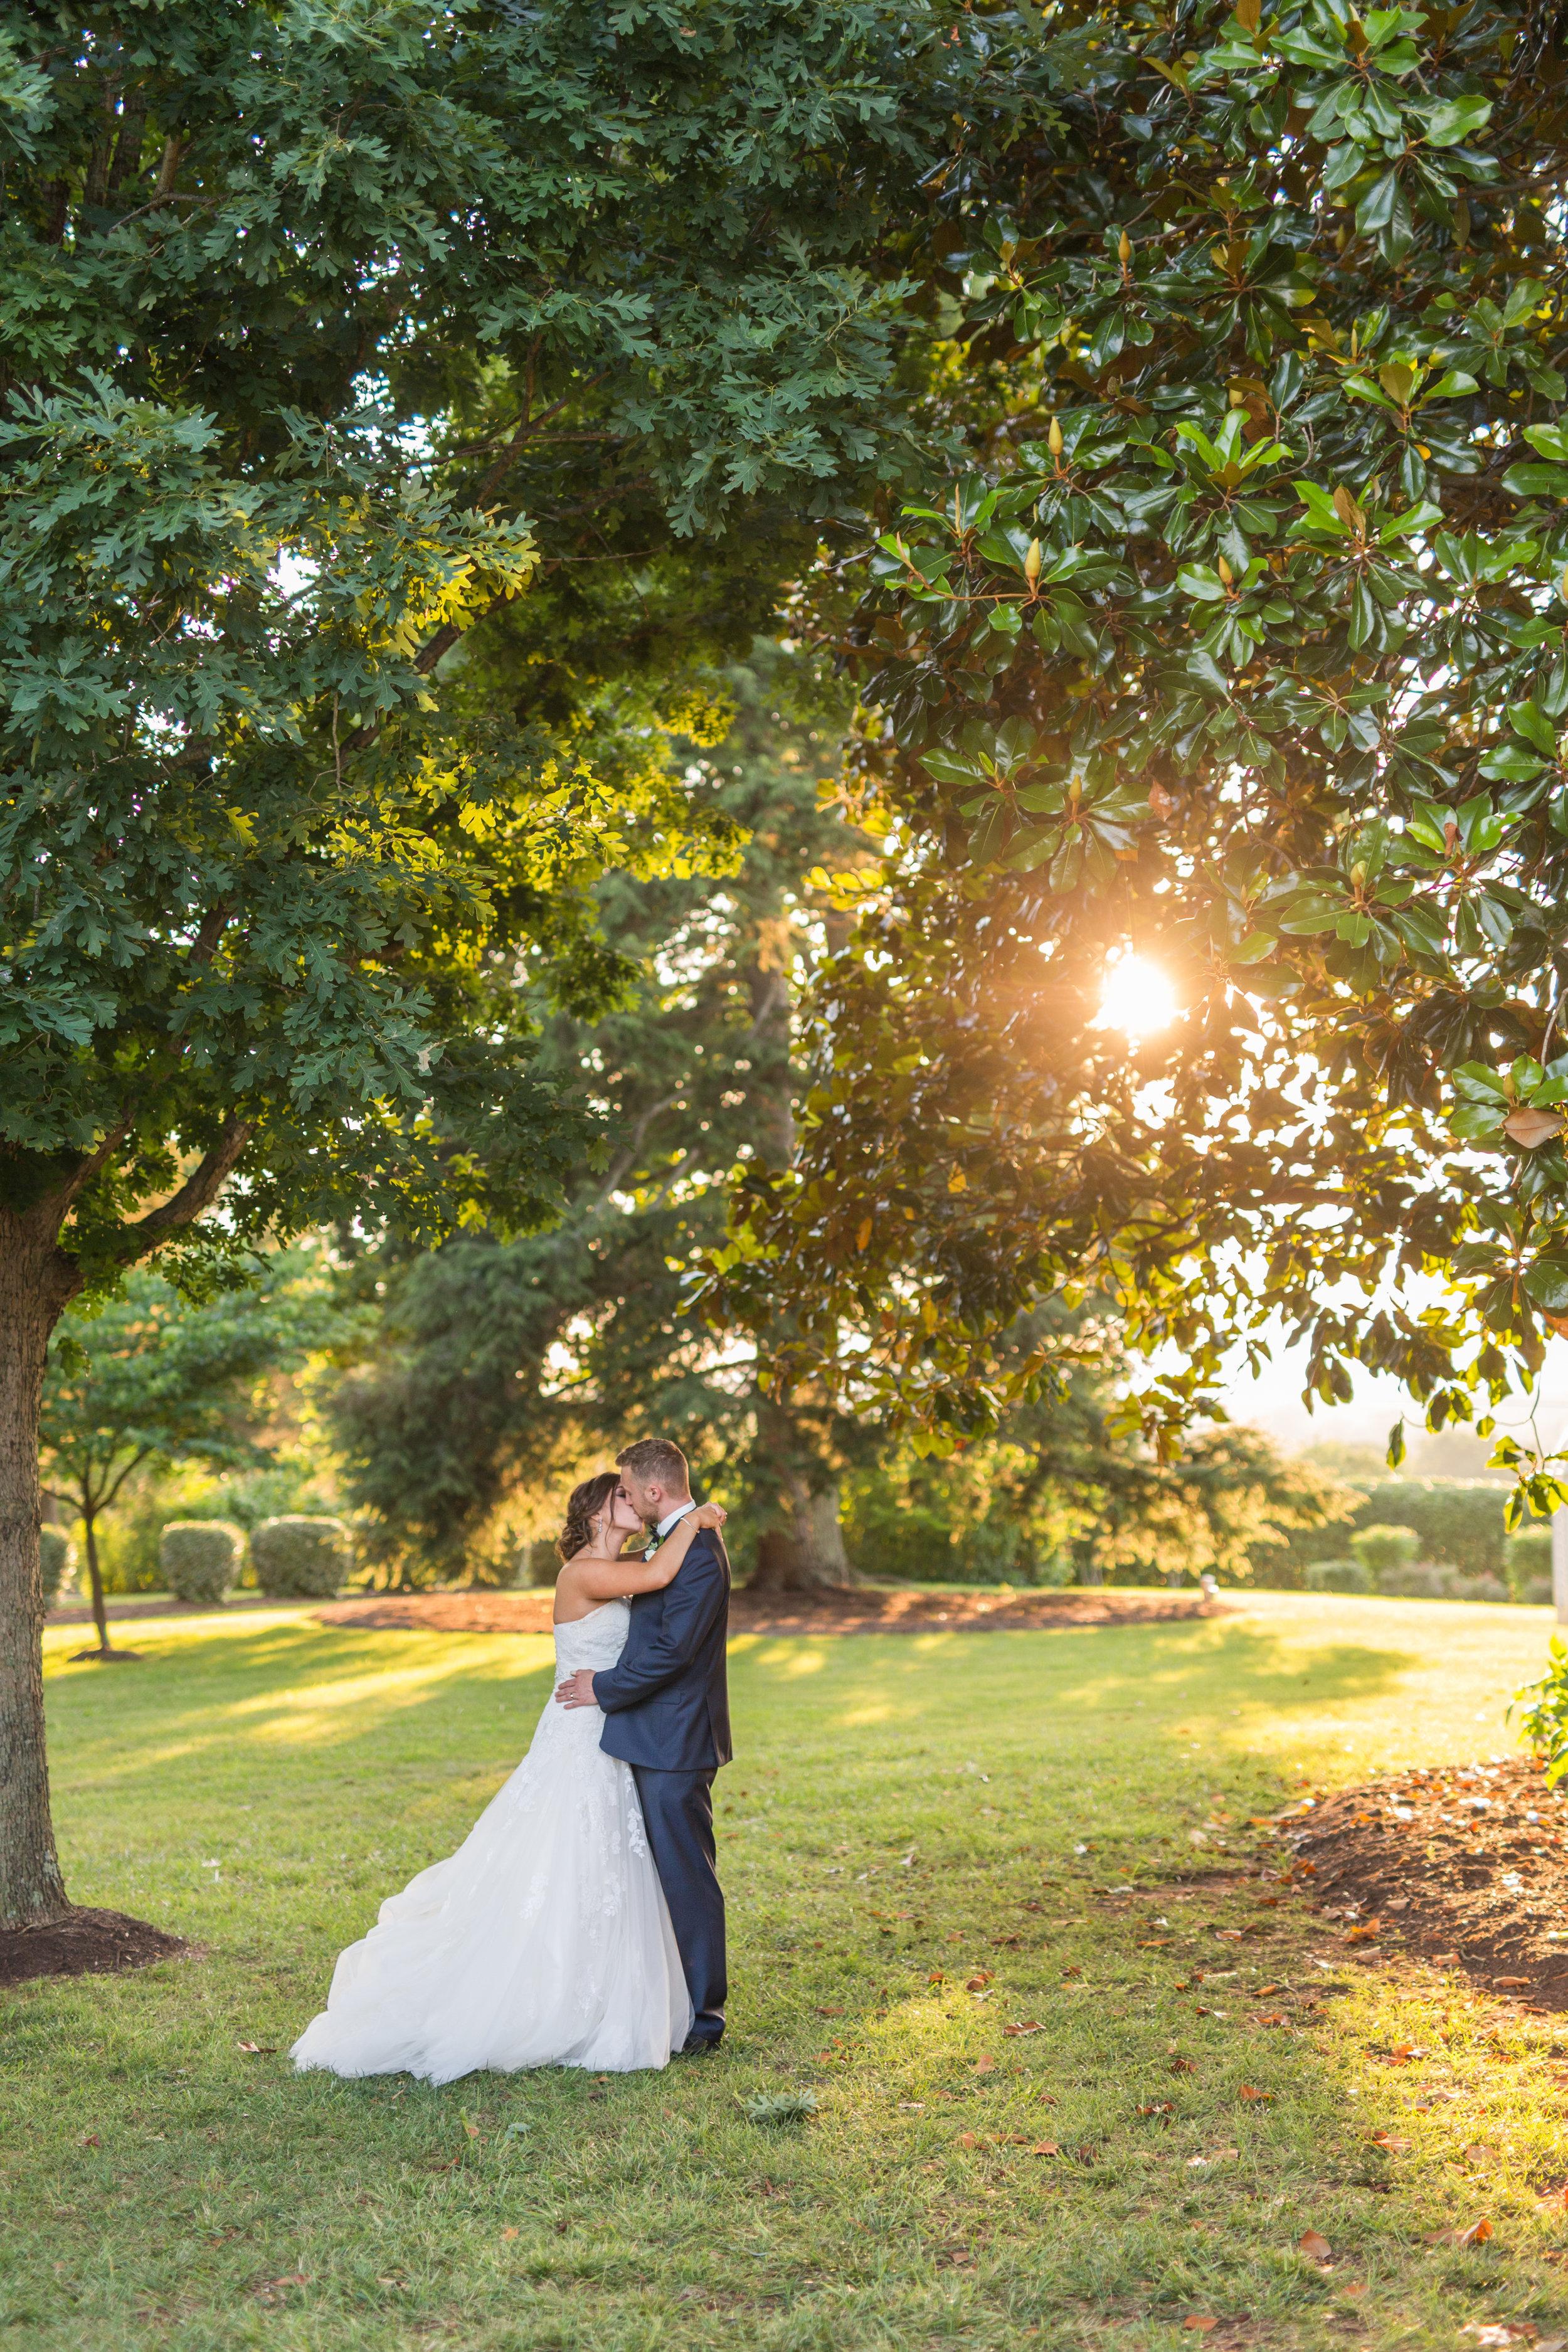 Write here…Lynchburg Virginia Wedding Photographer || Central Virginia Wedding Photos || Ashley Eiban Photography || www.ashleyeiban.com || The Trivium Estate Wedding